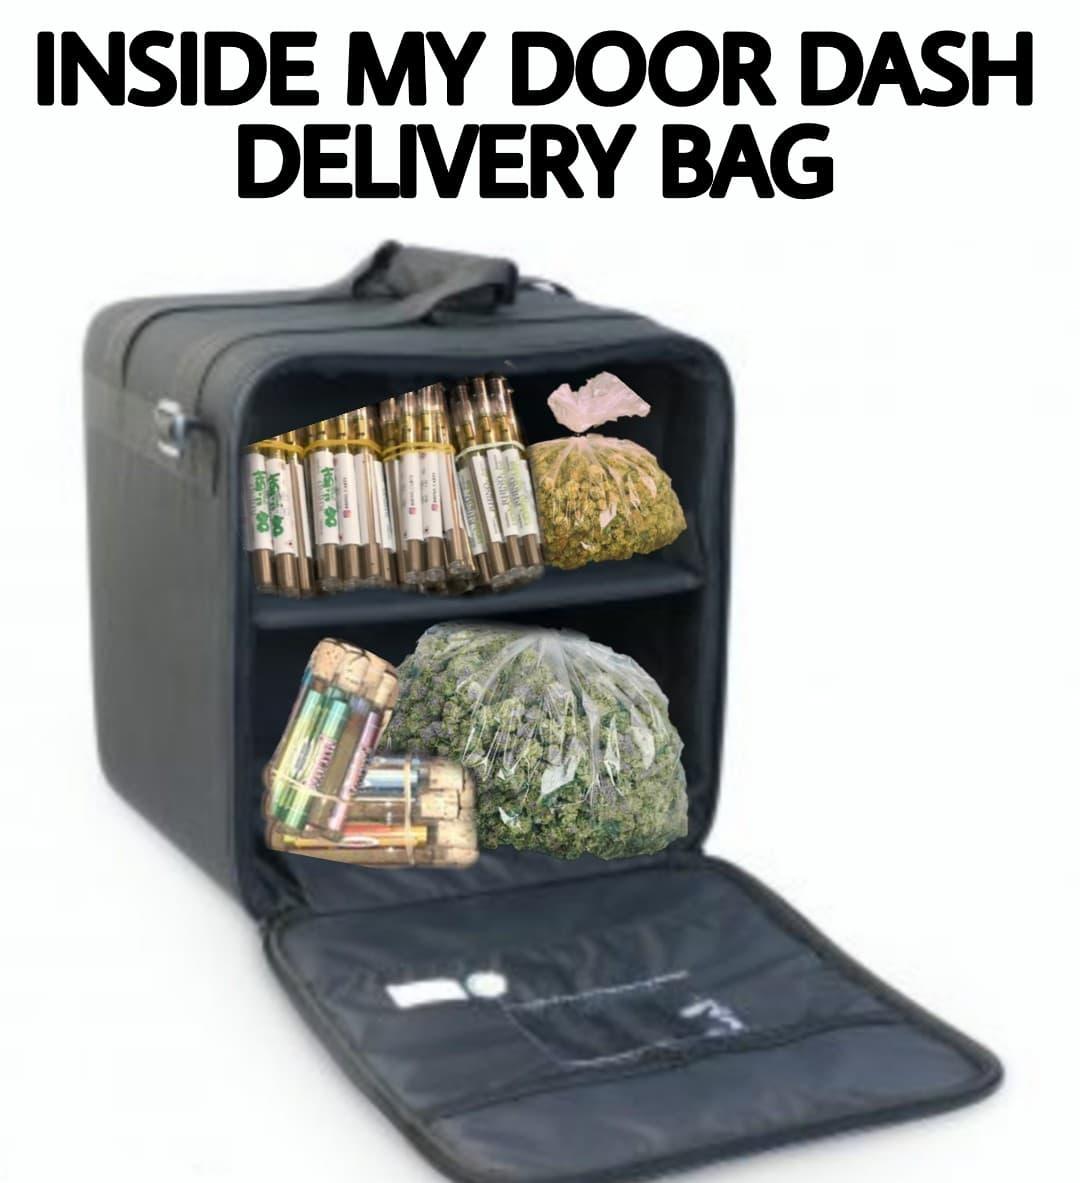 g bud bag.jpg